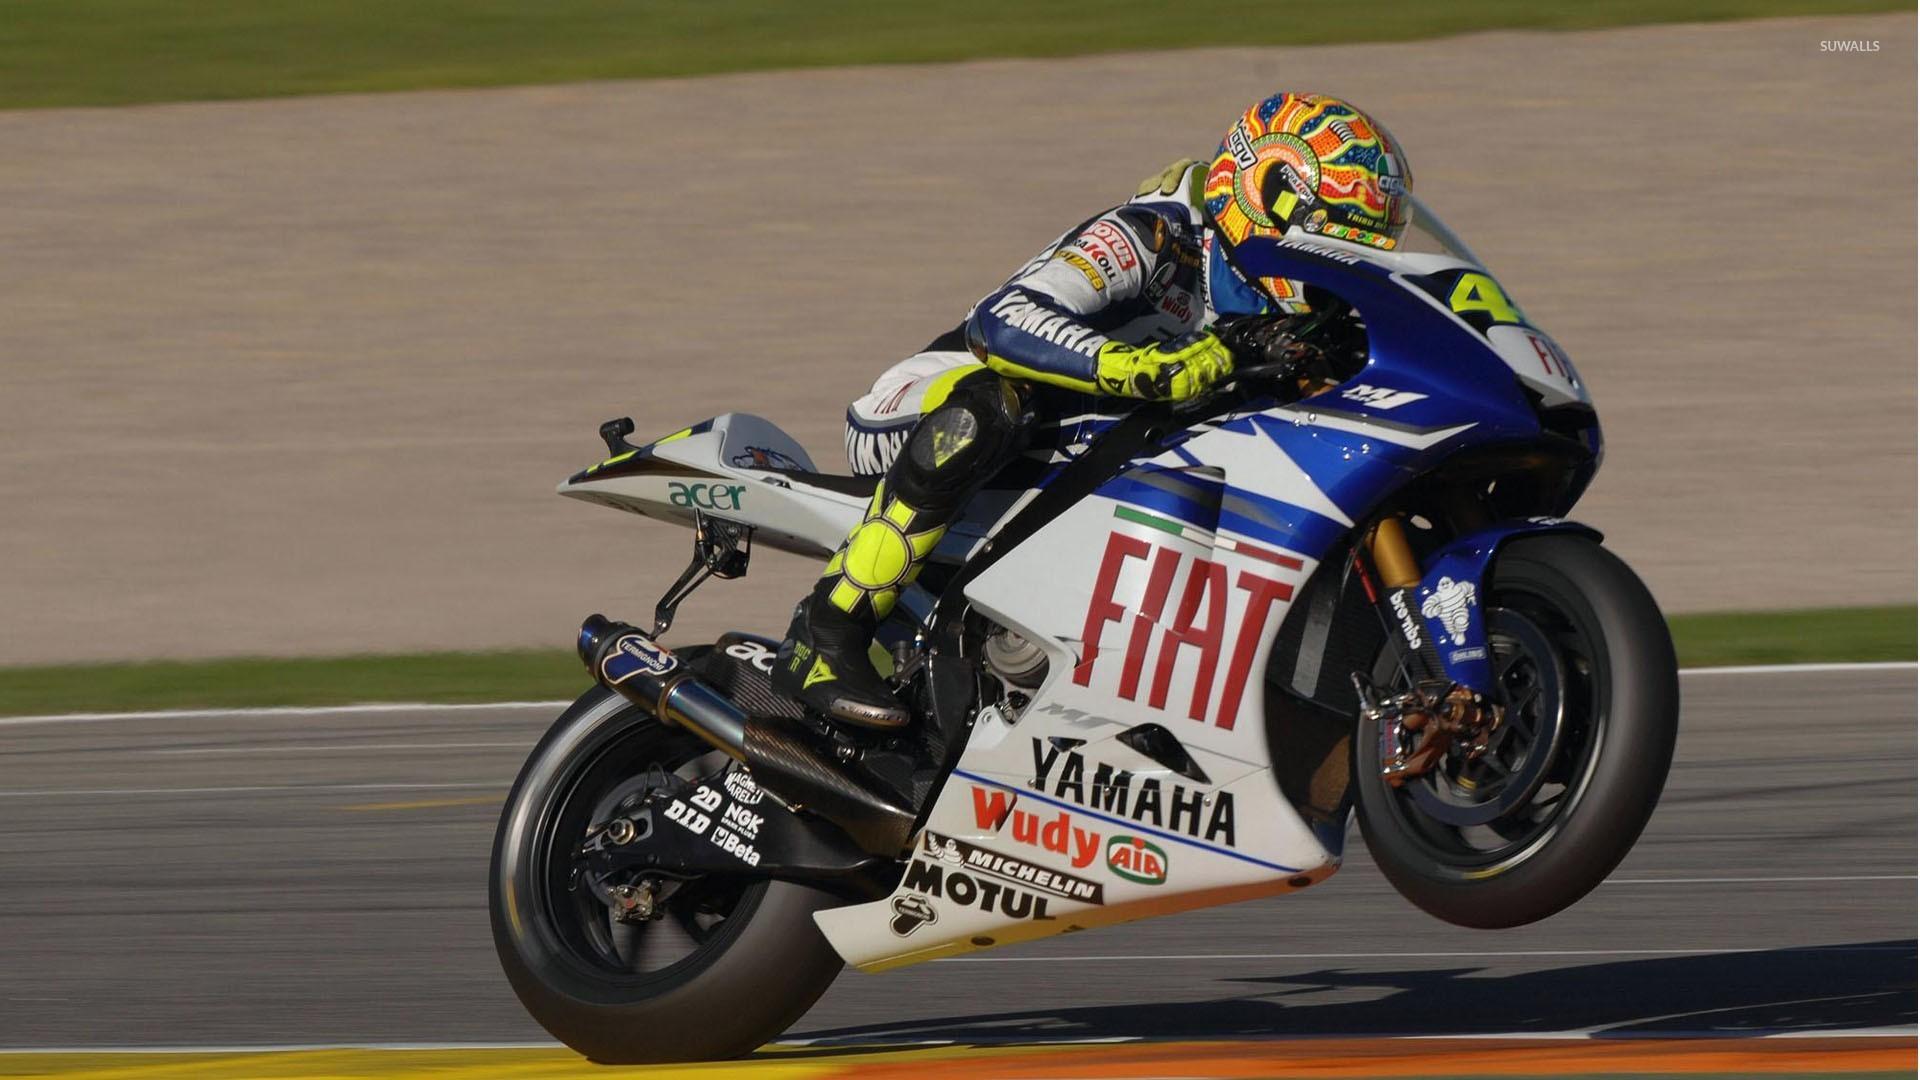 3d Wallpaper Motorcycle Wheelies Valentino Rossi Wallpapers 59 Wallpapers Hd Wallpapers